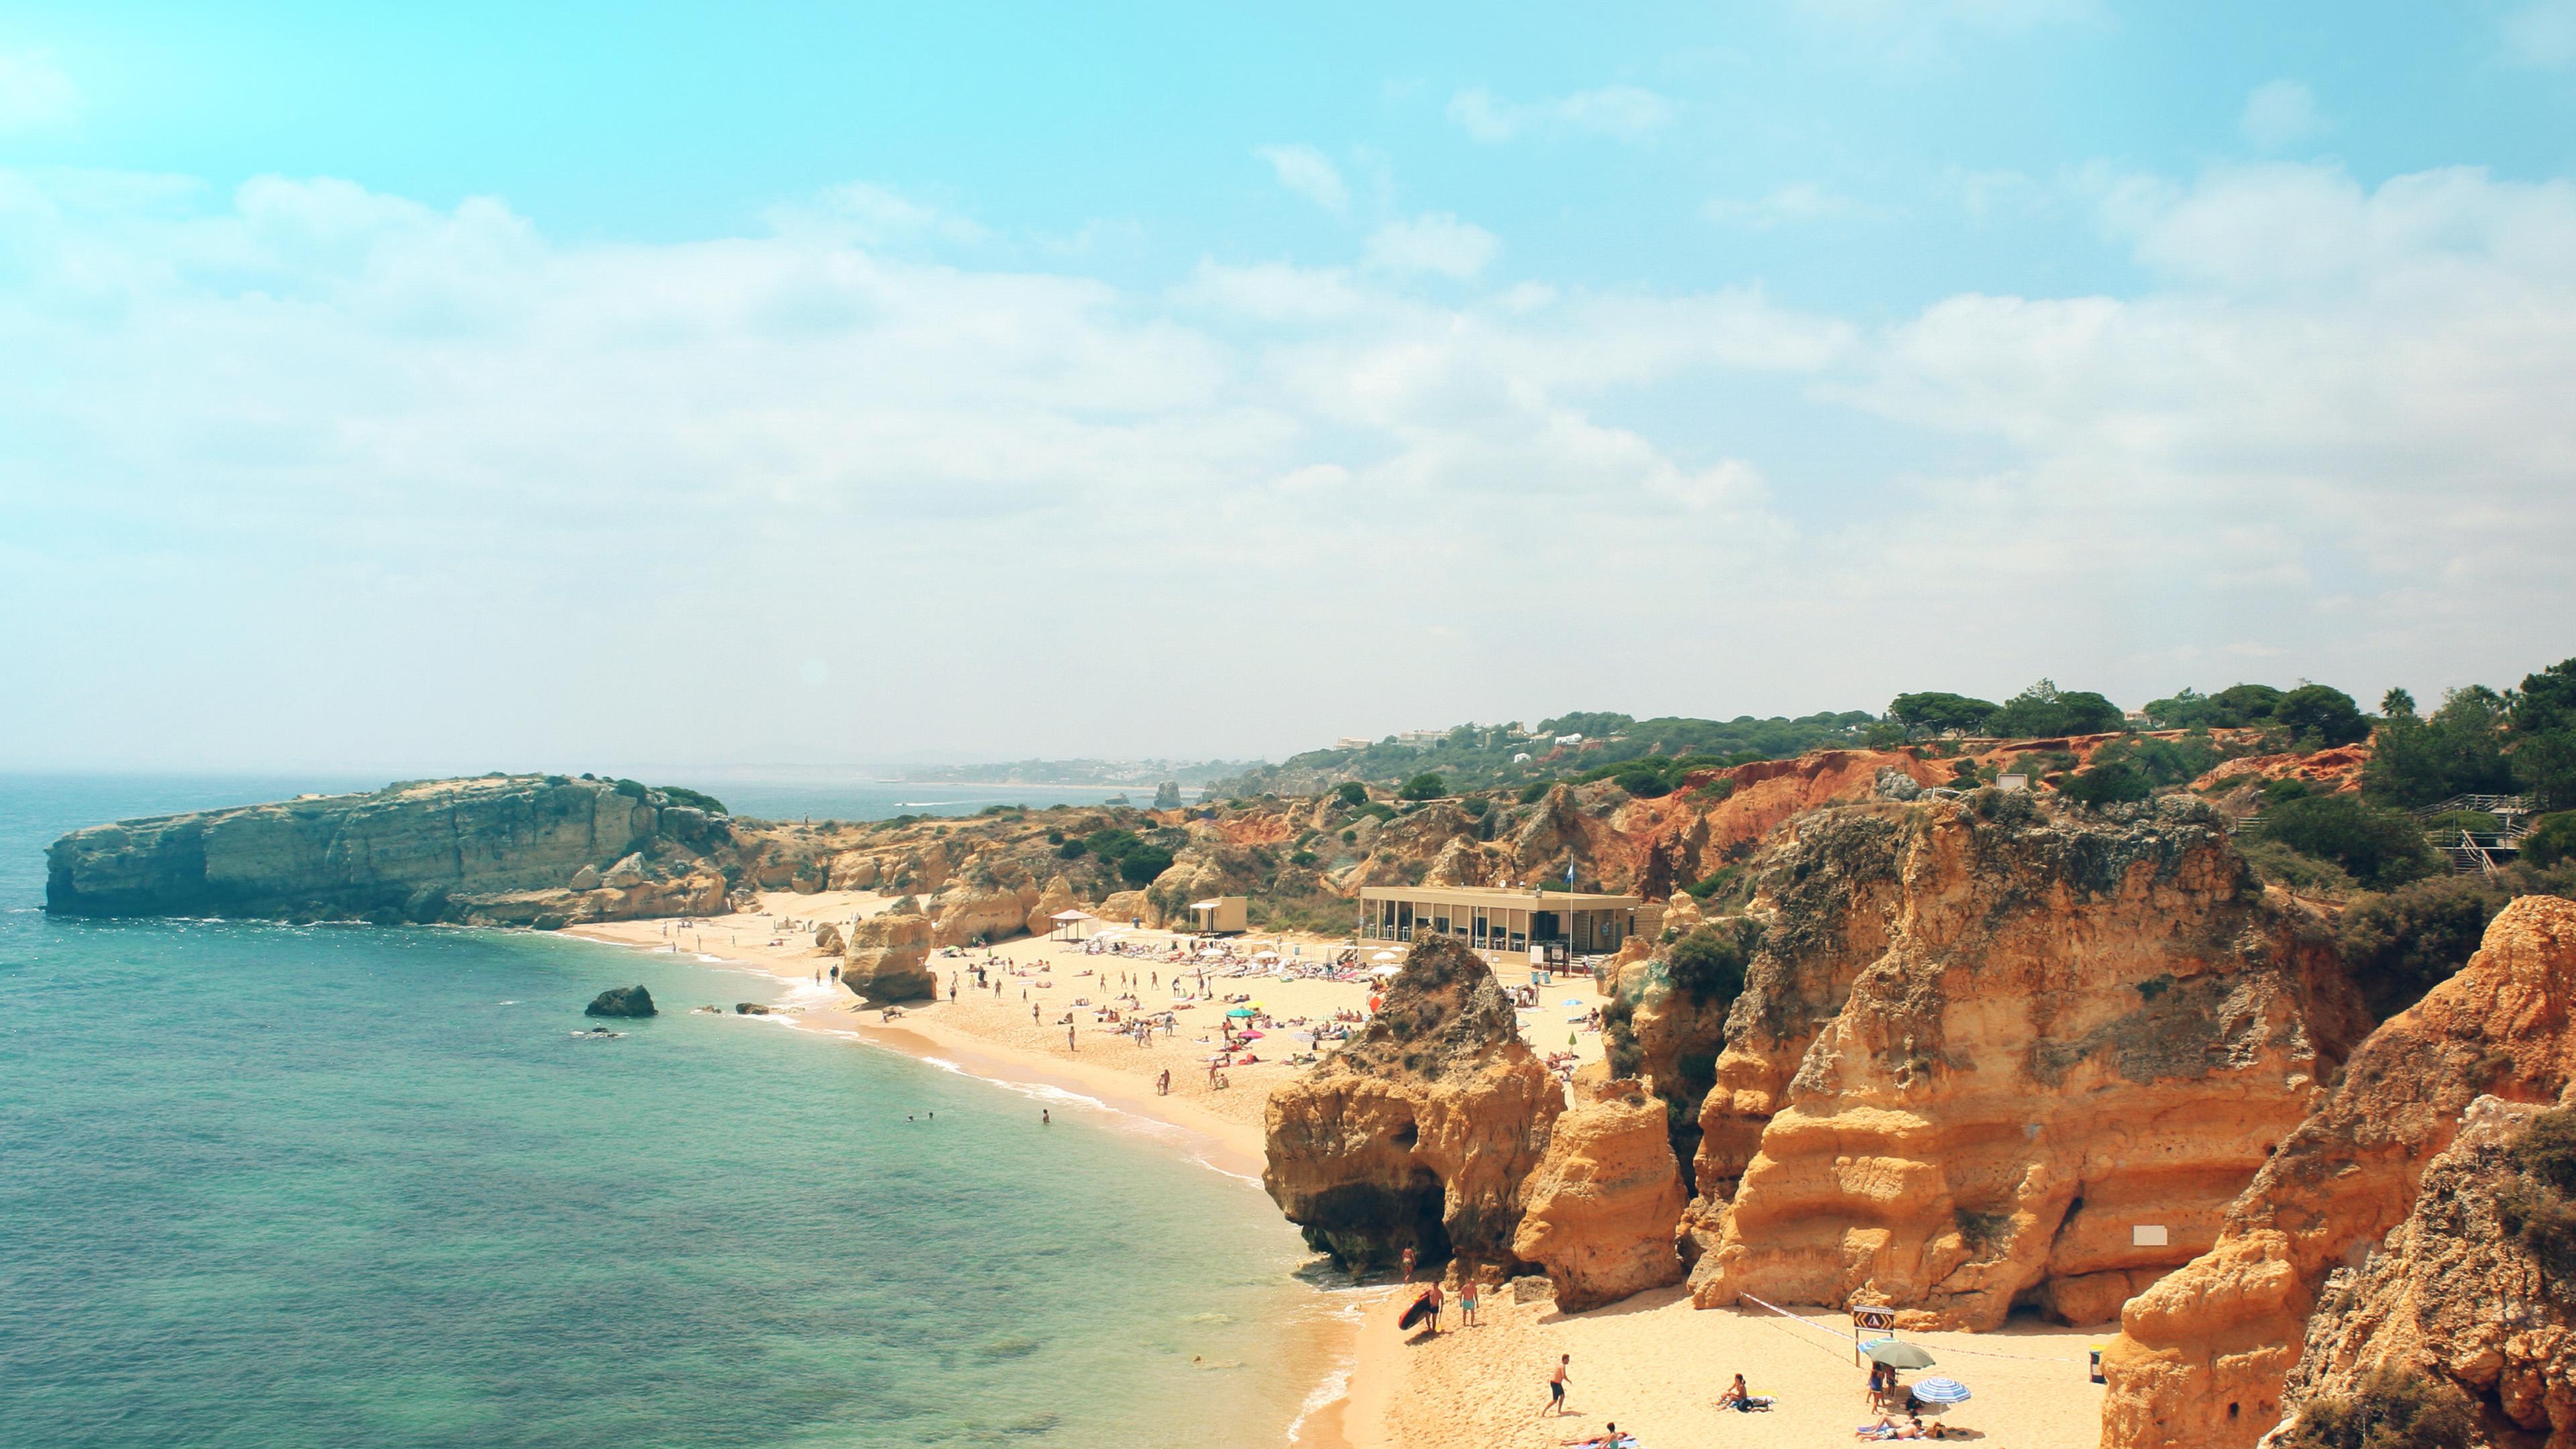 mr85-coast-beach-sunny-holiday-vacation-sea-sky-flare - papers.co